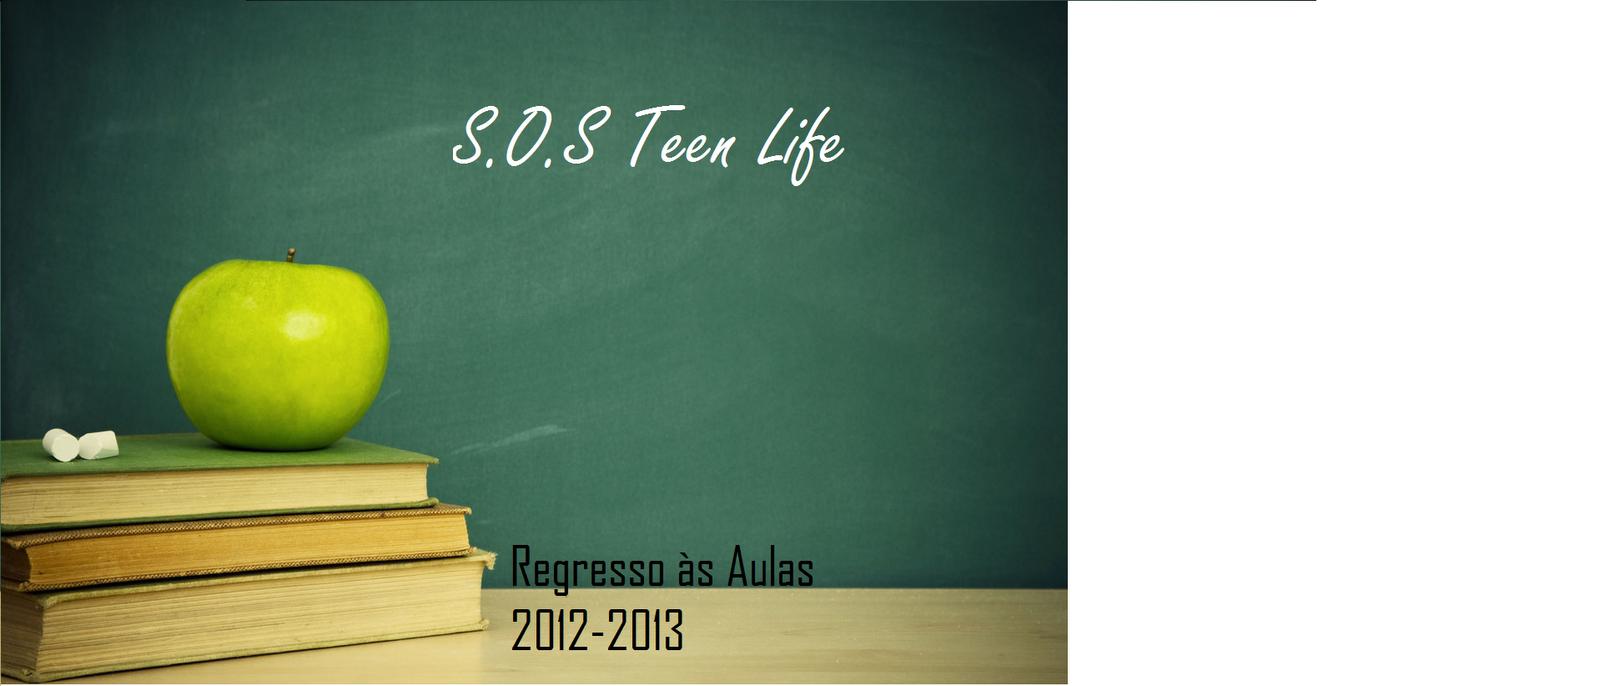 S.O.S Teen Life